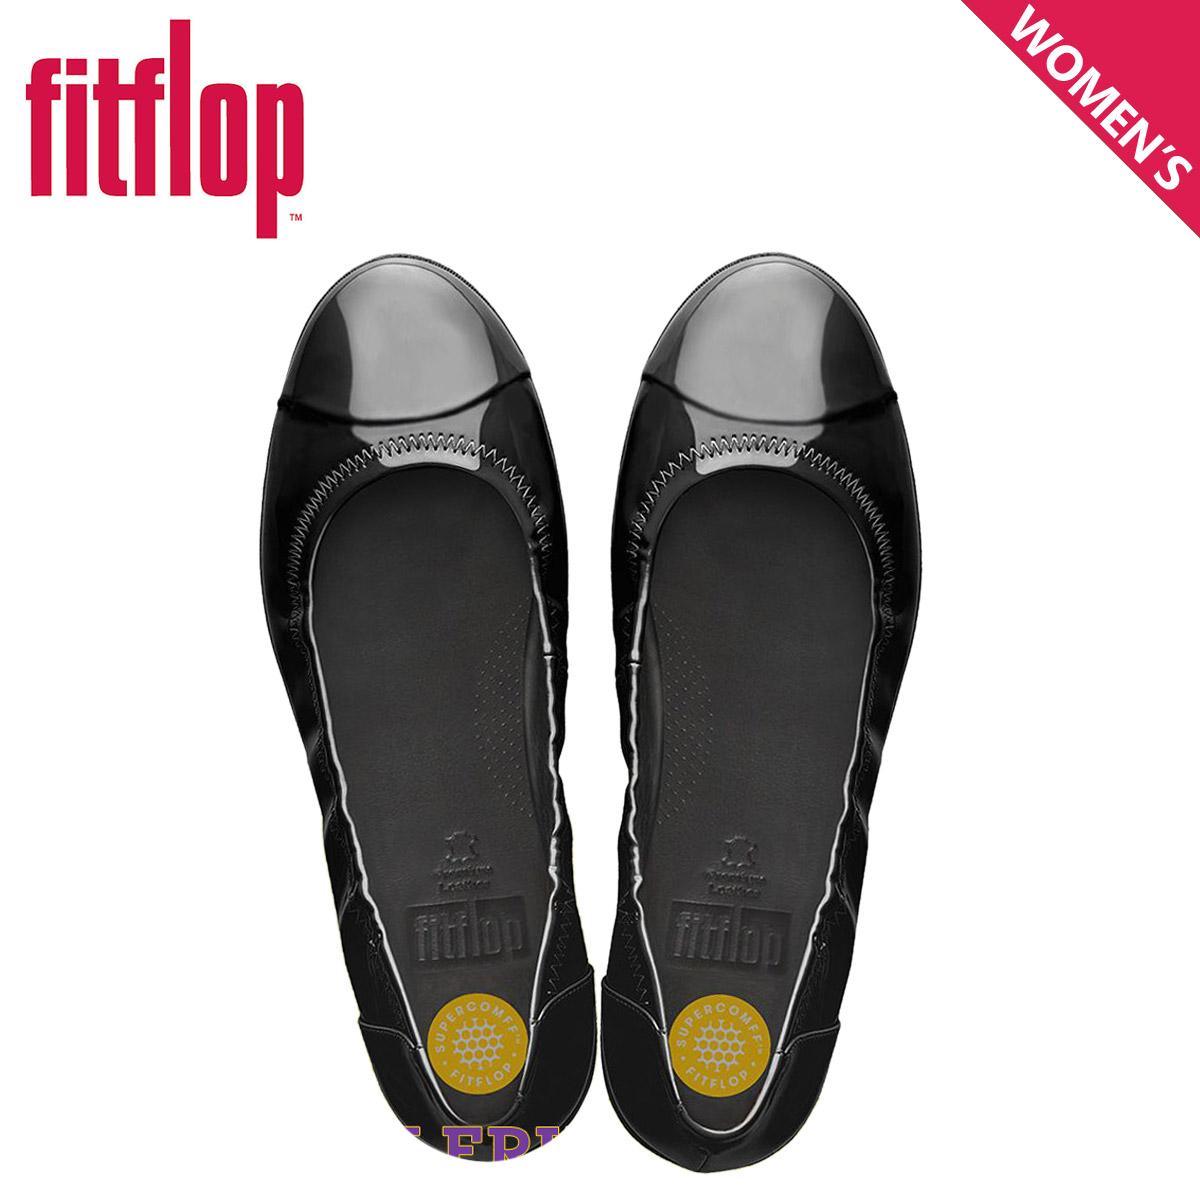 migliore a buon mercato 61d9b 4c63b Sugar Online Shop: Fitting FLOP FitFlop pumps ballerina F-POP ...